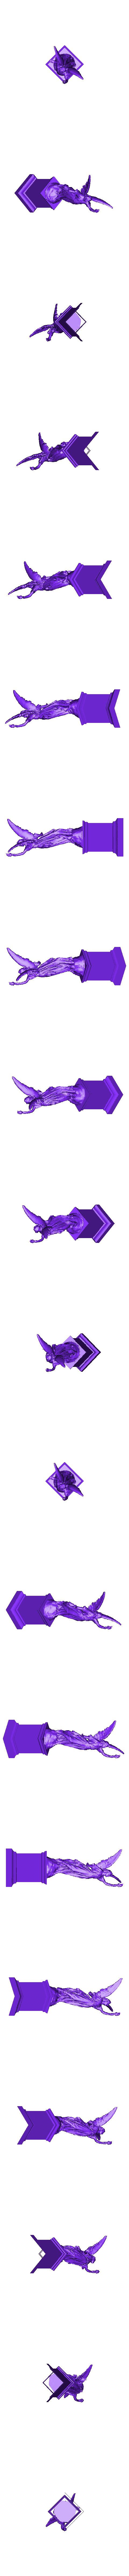 StatueWithFire.stl Download free STL file Angel statue with fire • 3D printer template, Boris3dStudio